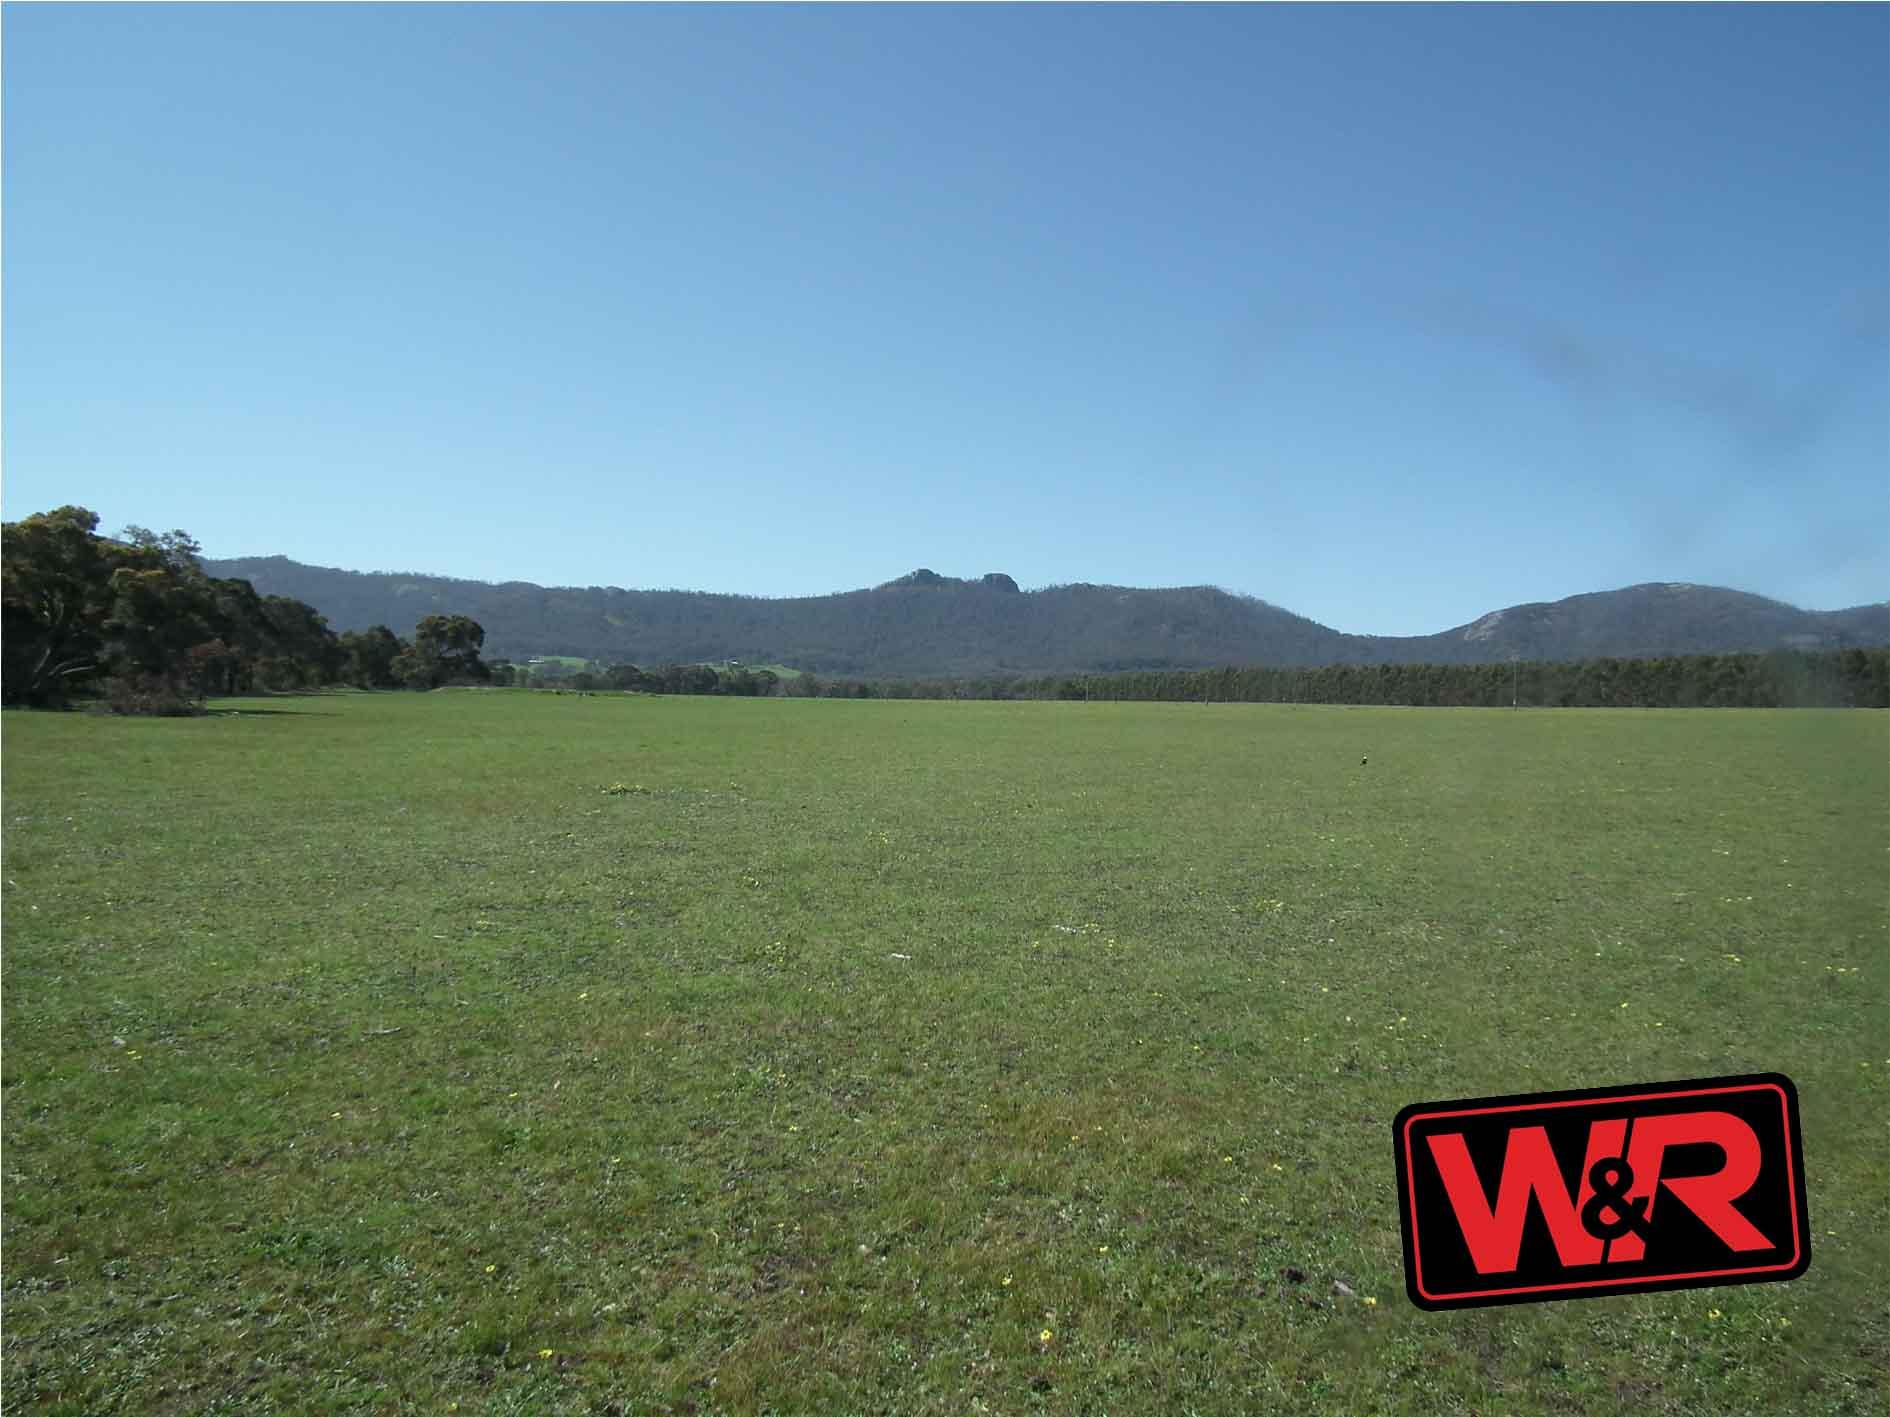 Property rural in PORONGURUP